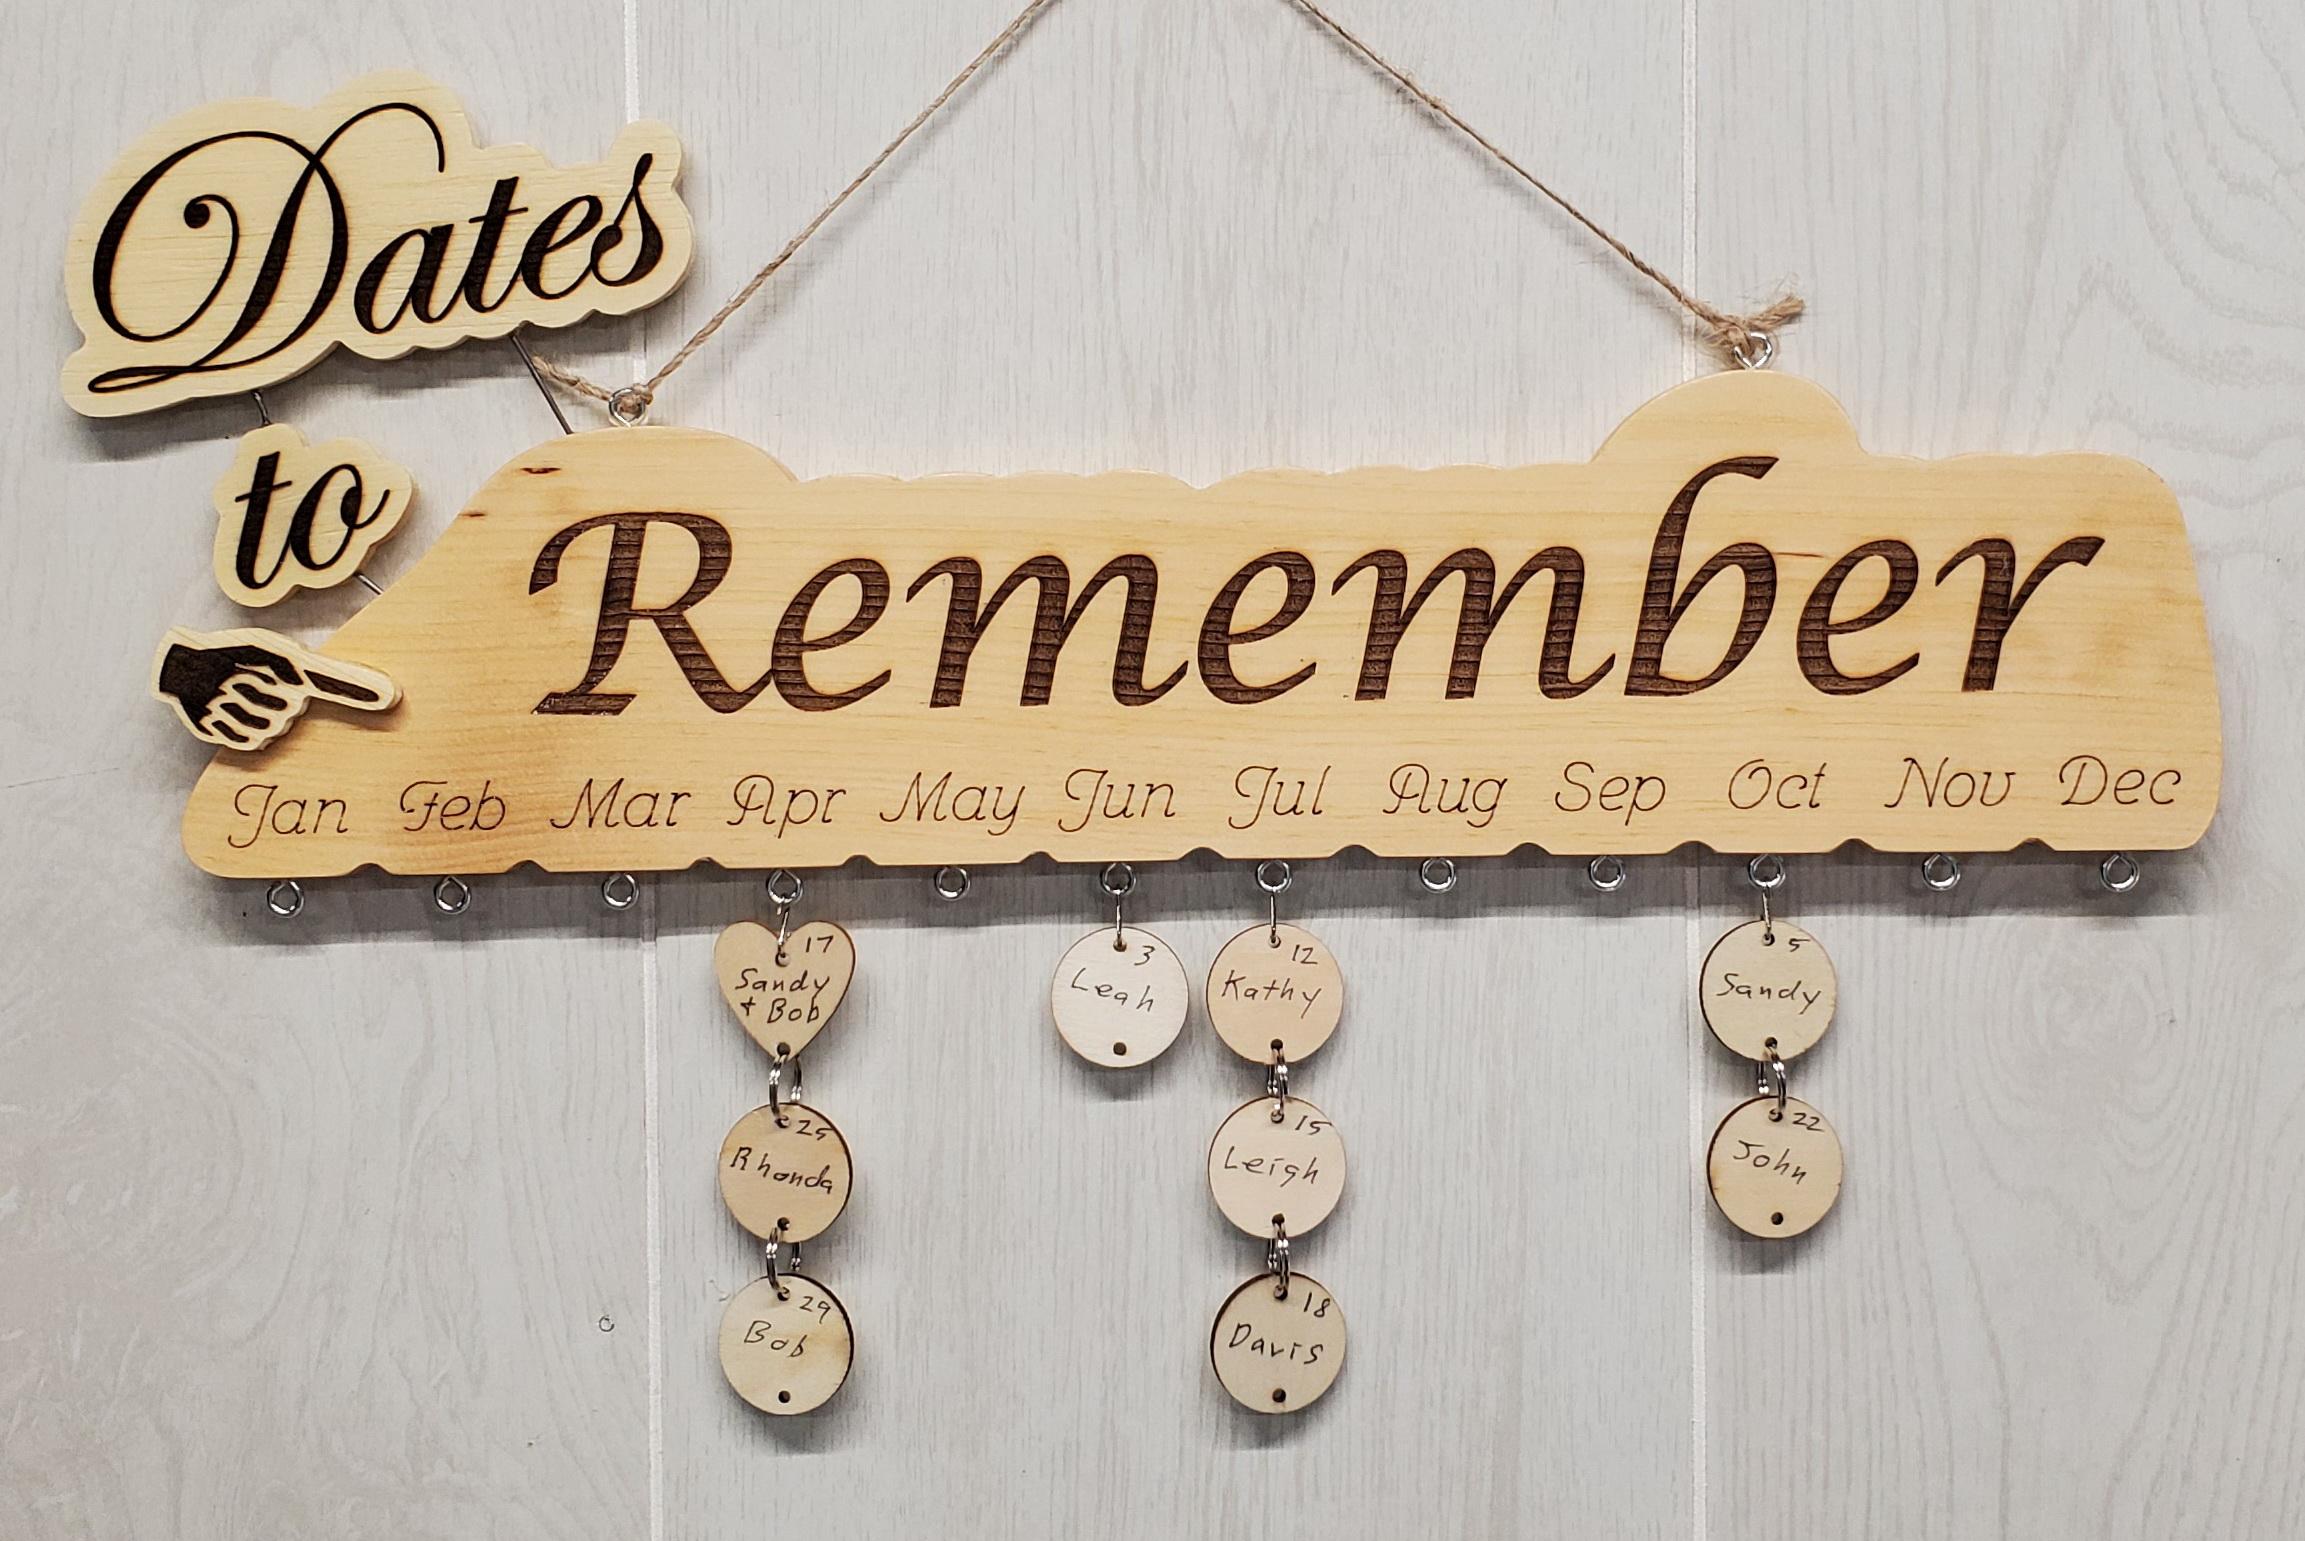 Dates to Remember hanging disk calendar